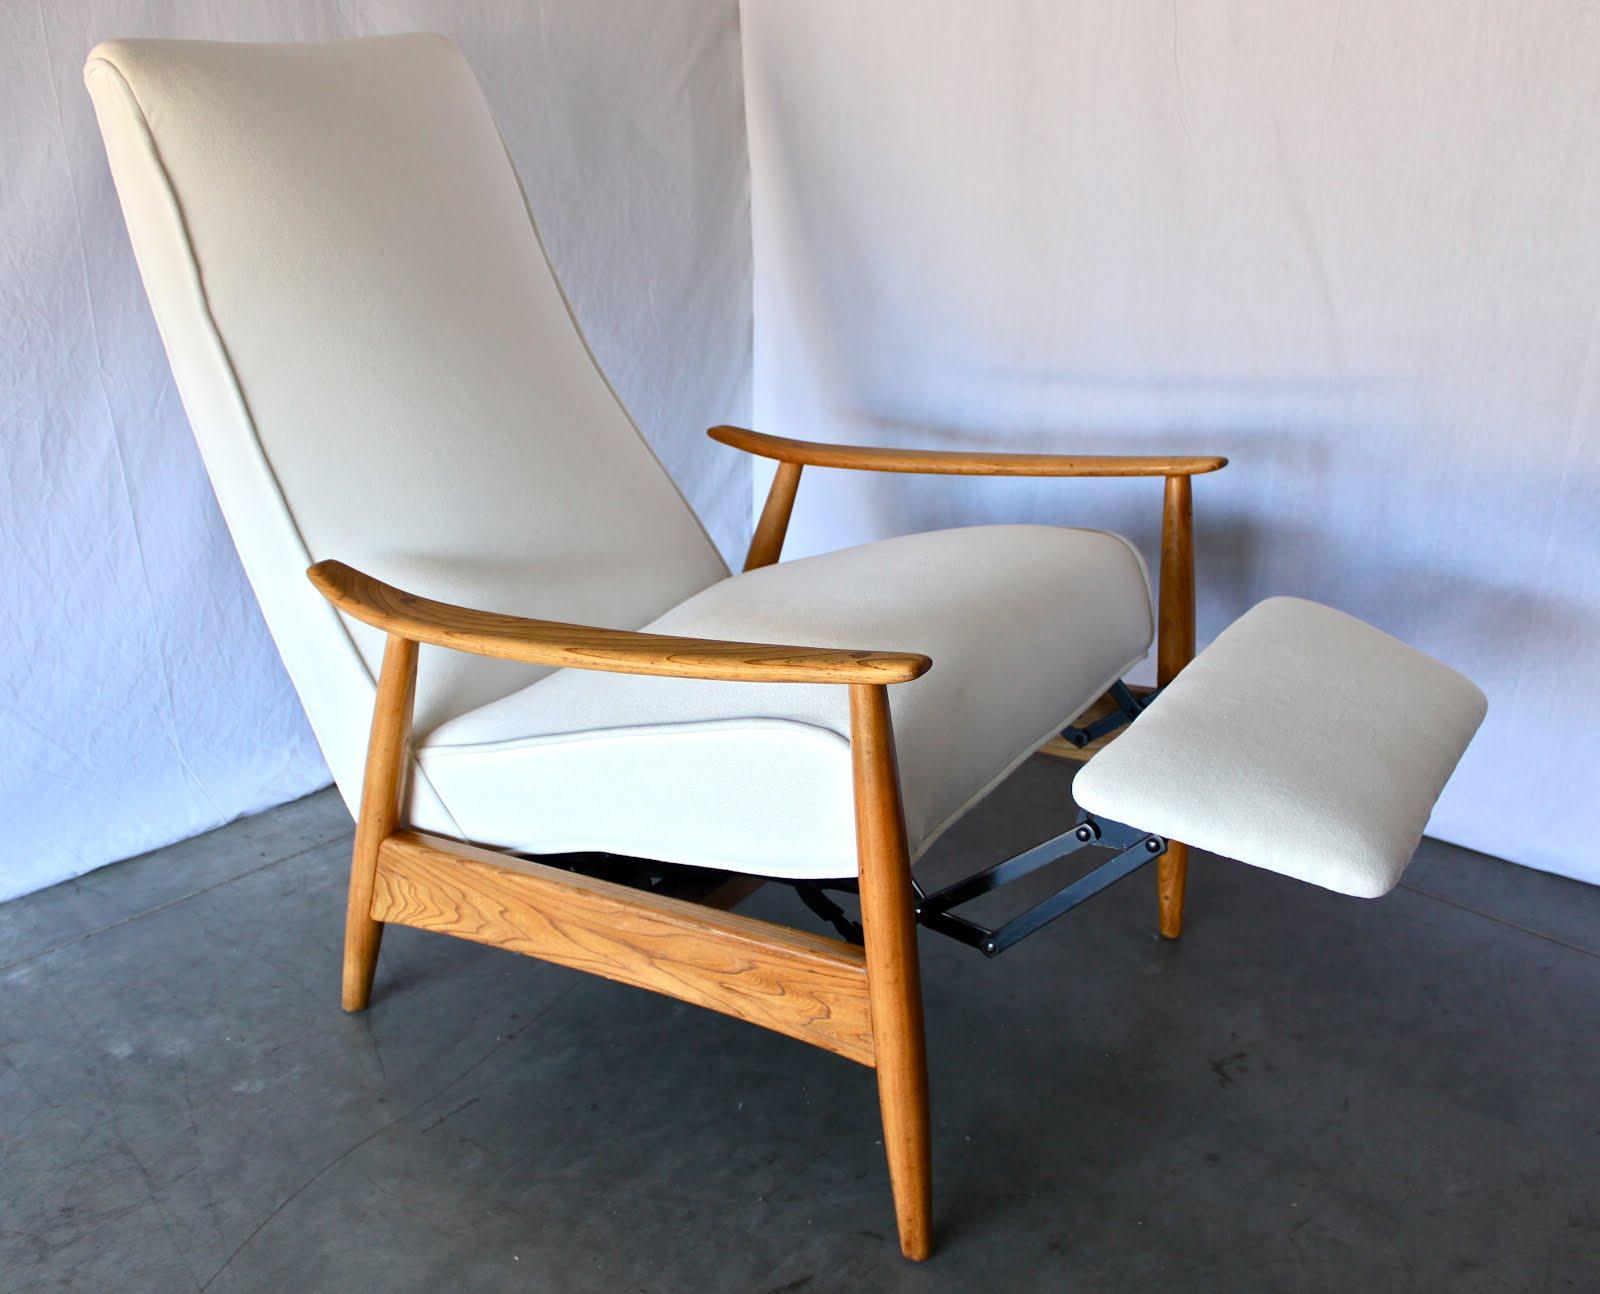 Modernhaus Shop Updates Milo Baughman Recliner Moroccan